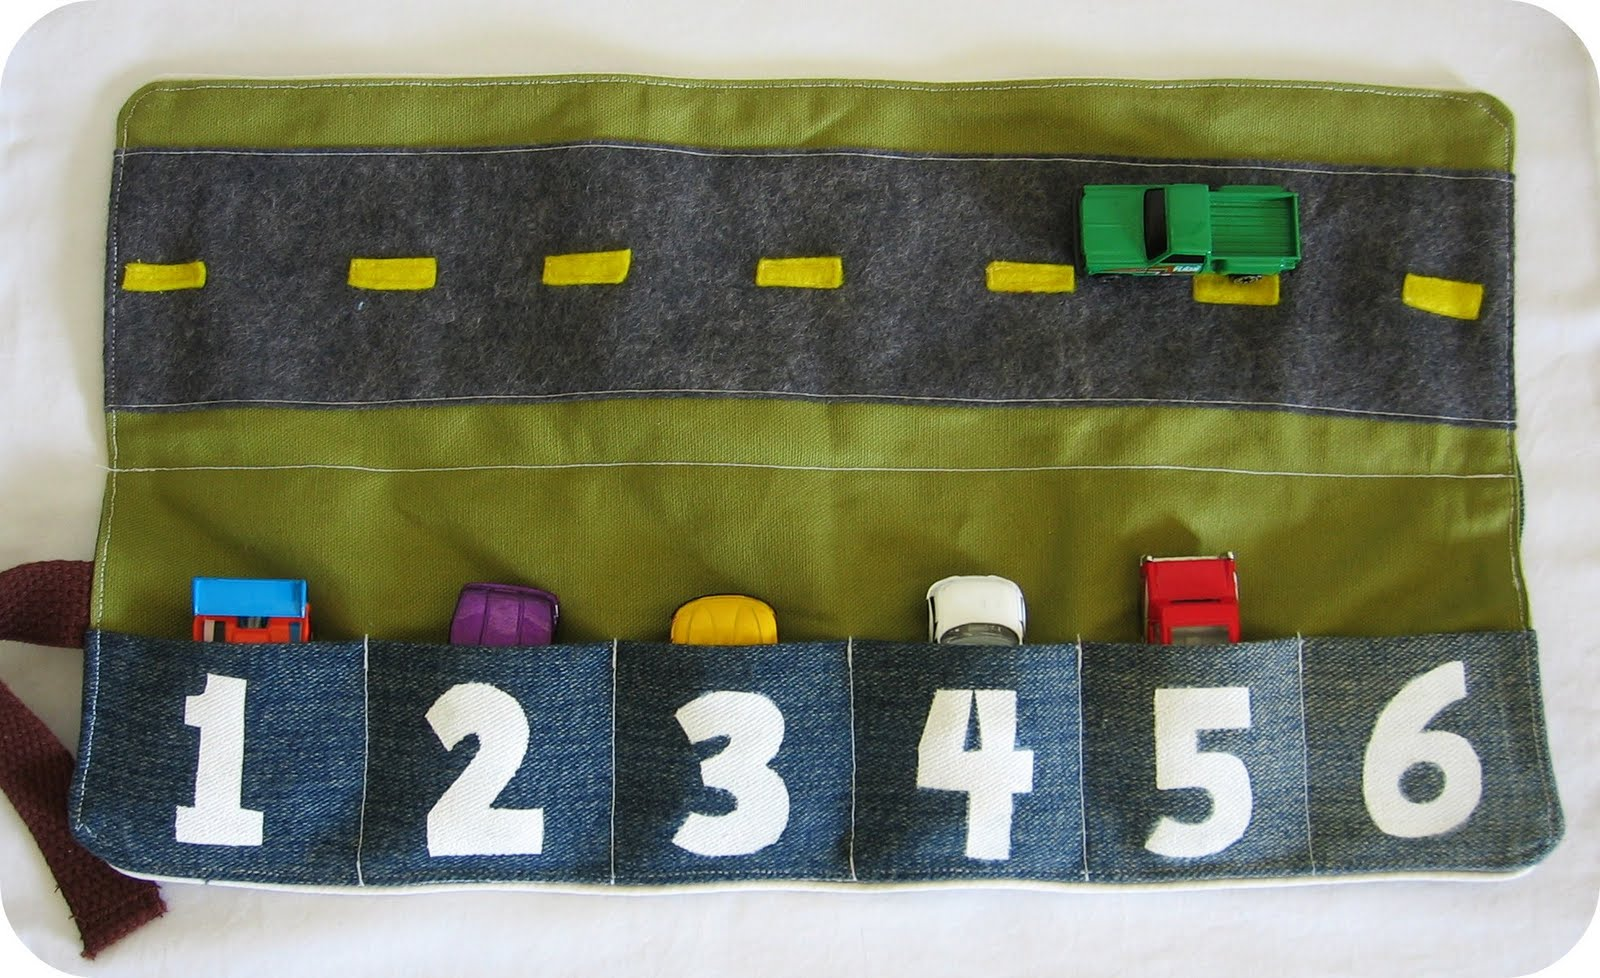 tranquility spot portable car activity mat set. Black Bedroom Furniture Sets. Home Design Ideas